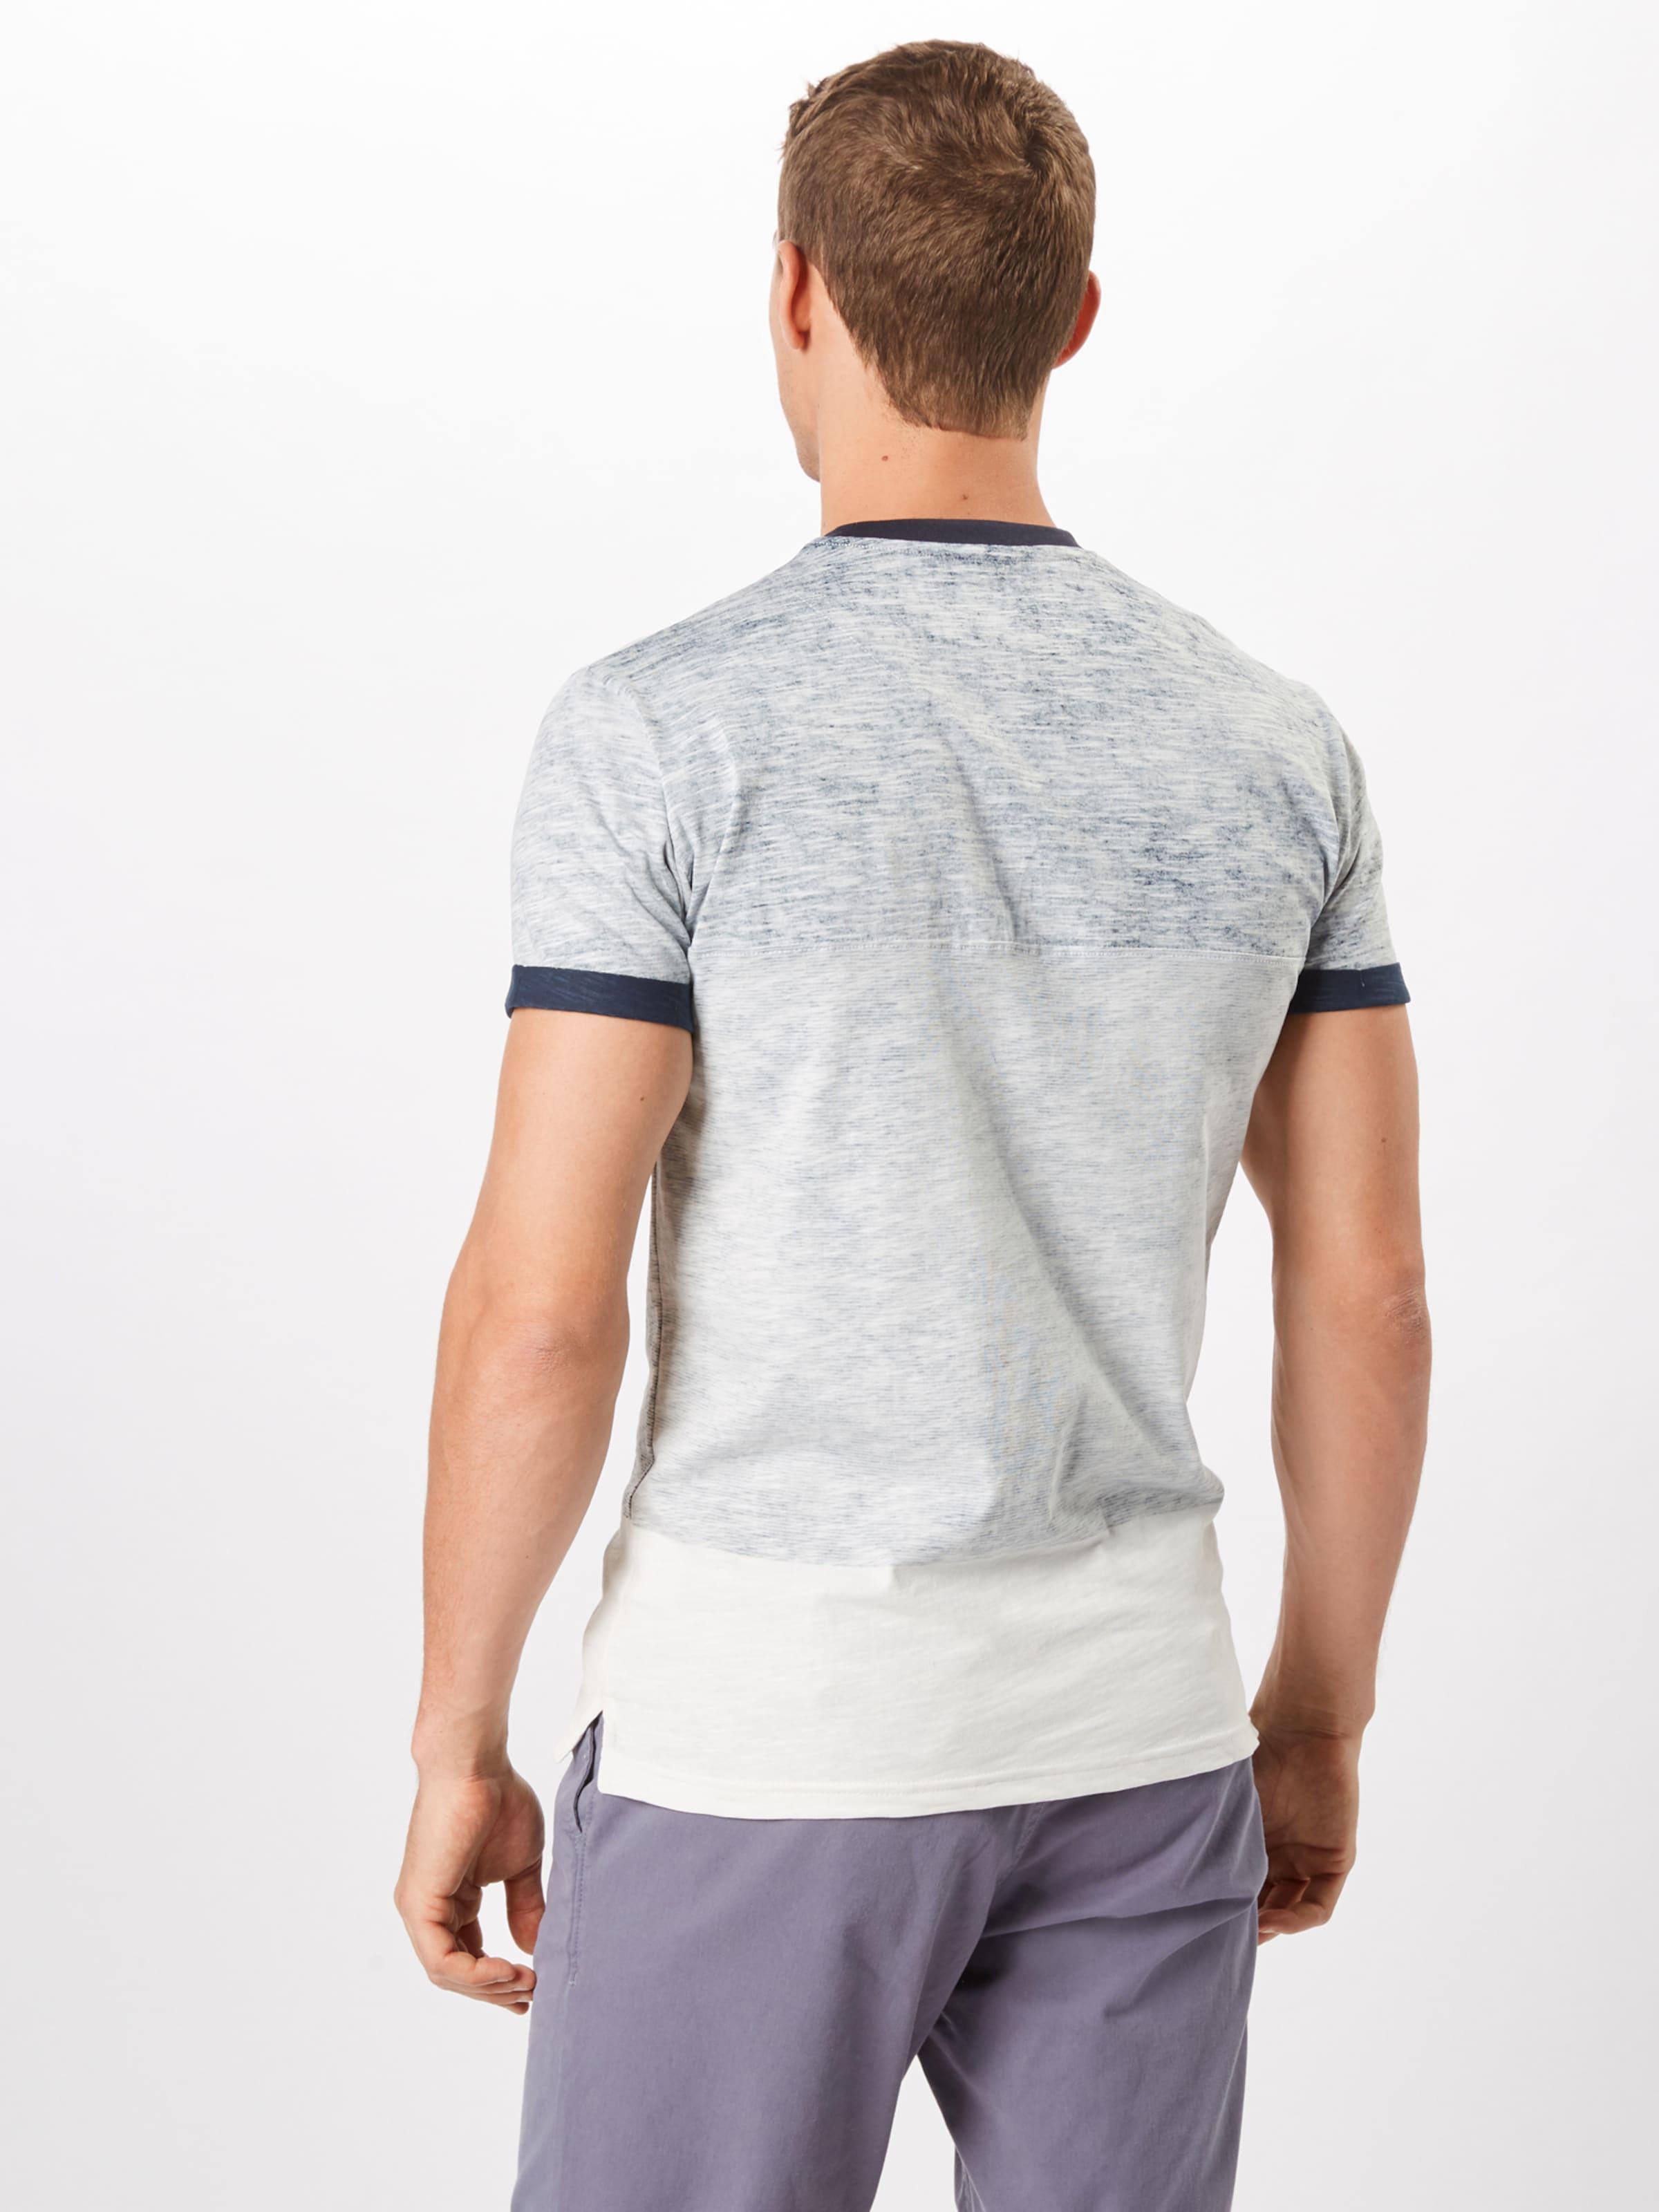 Fumé Indicode 'crombie' CrèmeBleu En Marine Gris Clair Jeans T shirt 6ybfgvY7